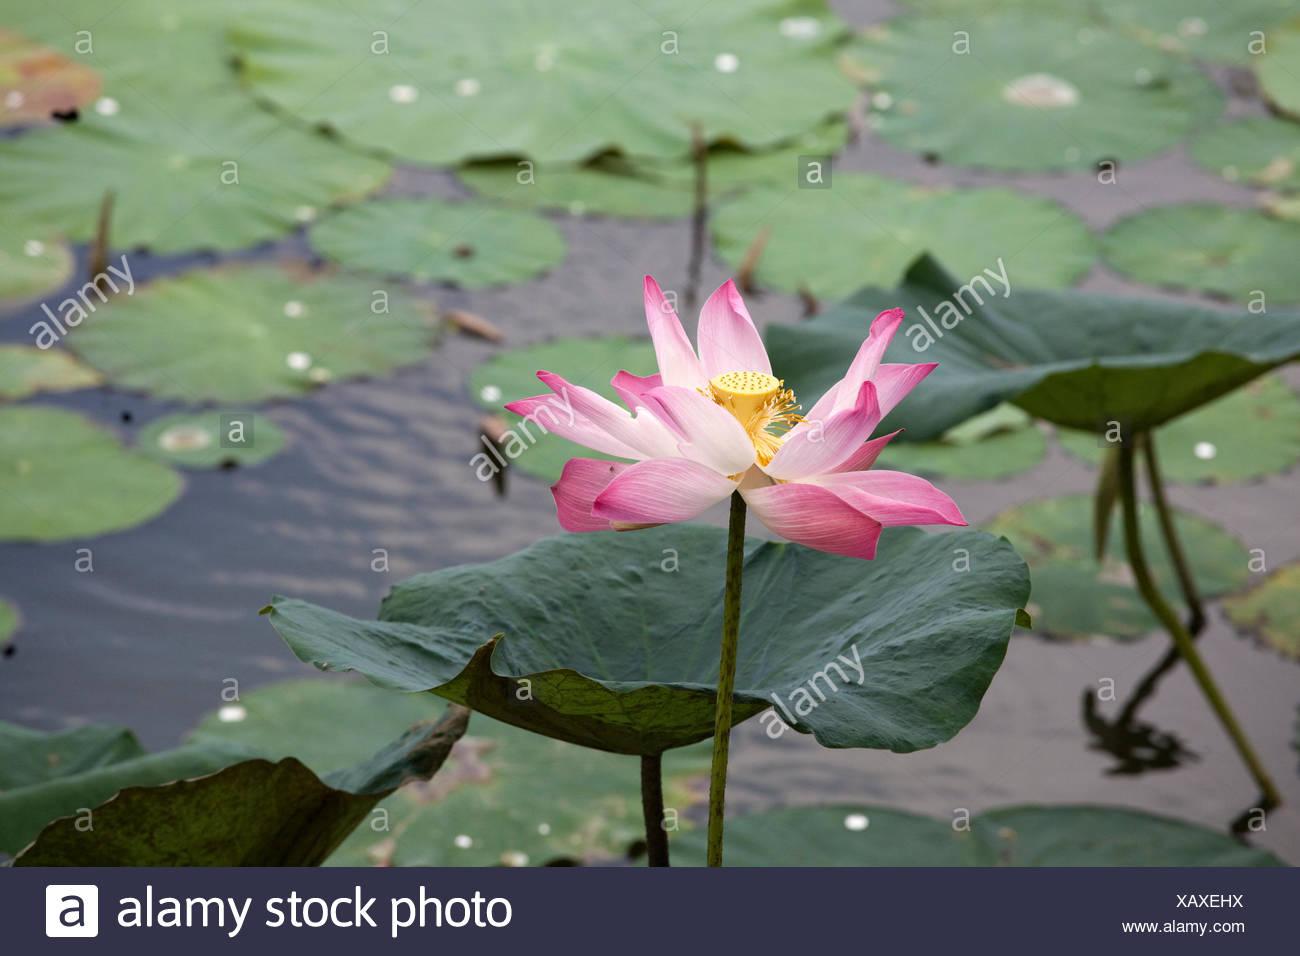 Lotus flower pond asia stock photos lotus flower pond asia stock lotus flower nelumbo sp in a pond in a mekong delta izmirmasajfo